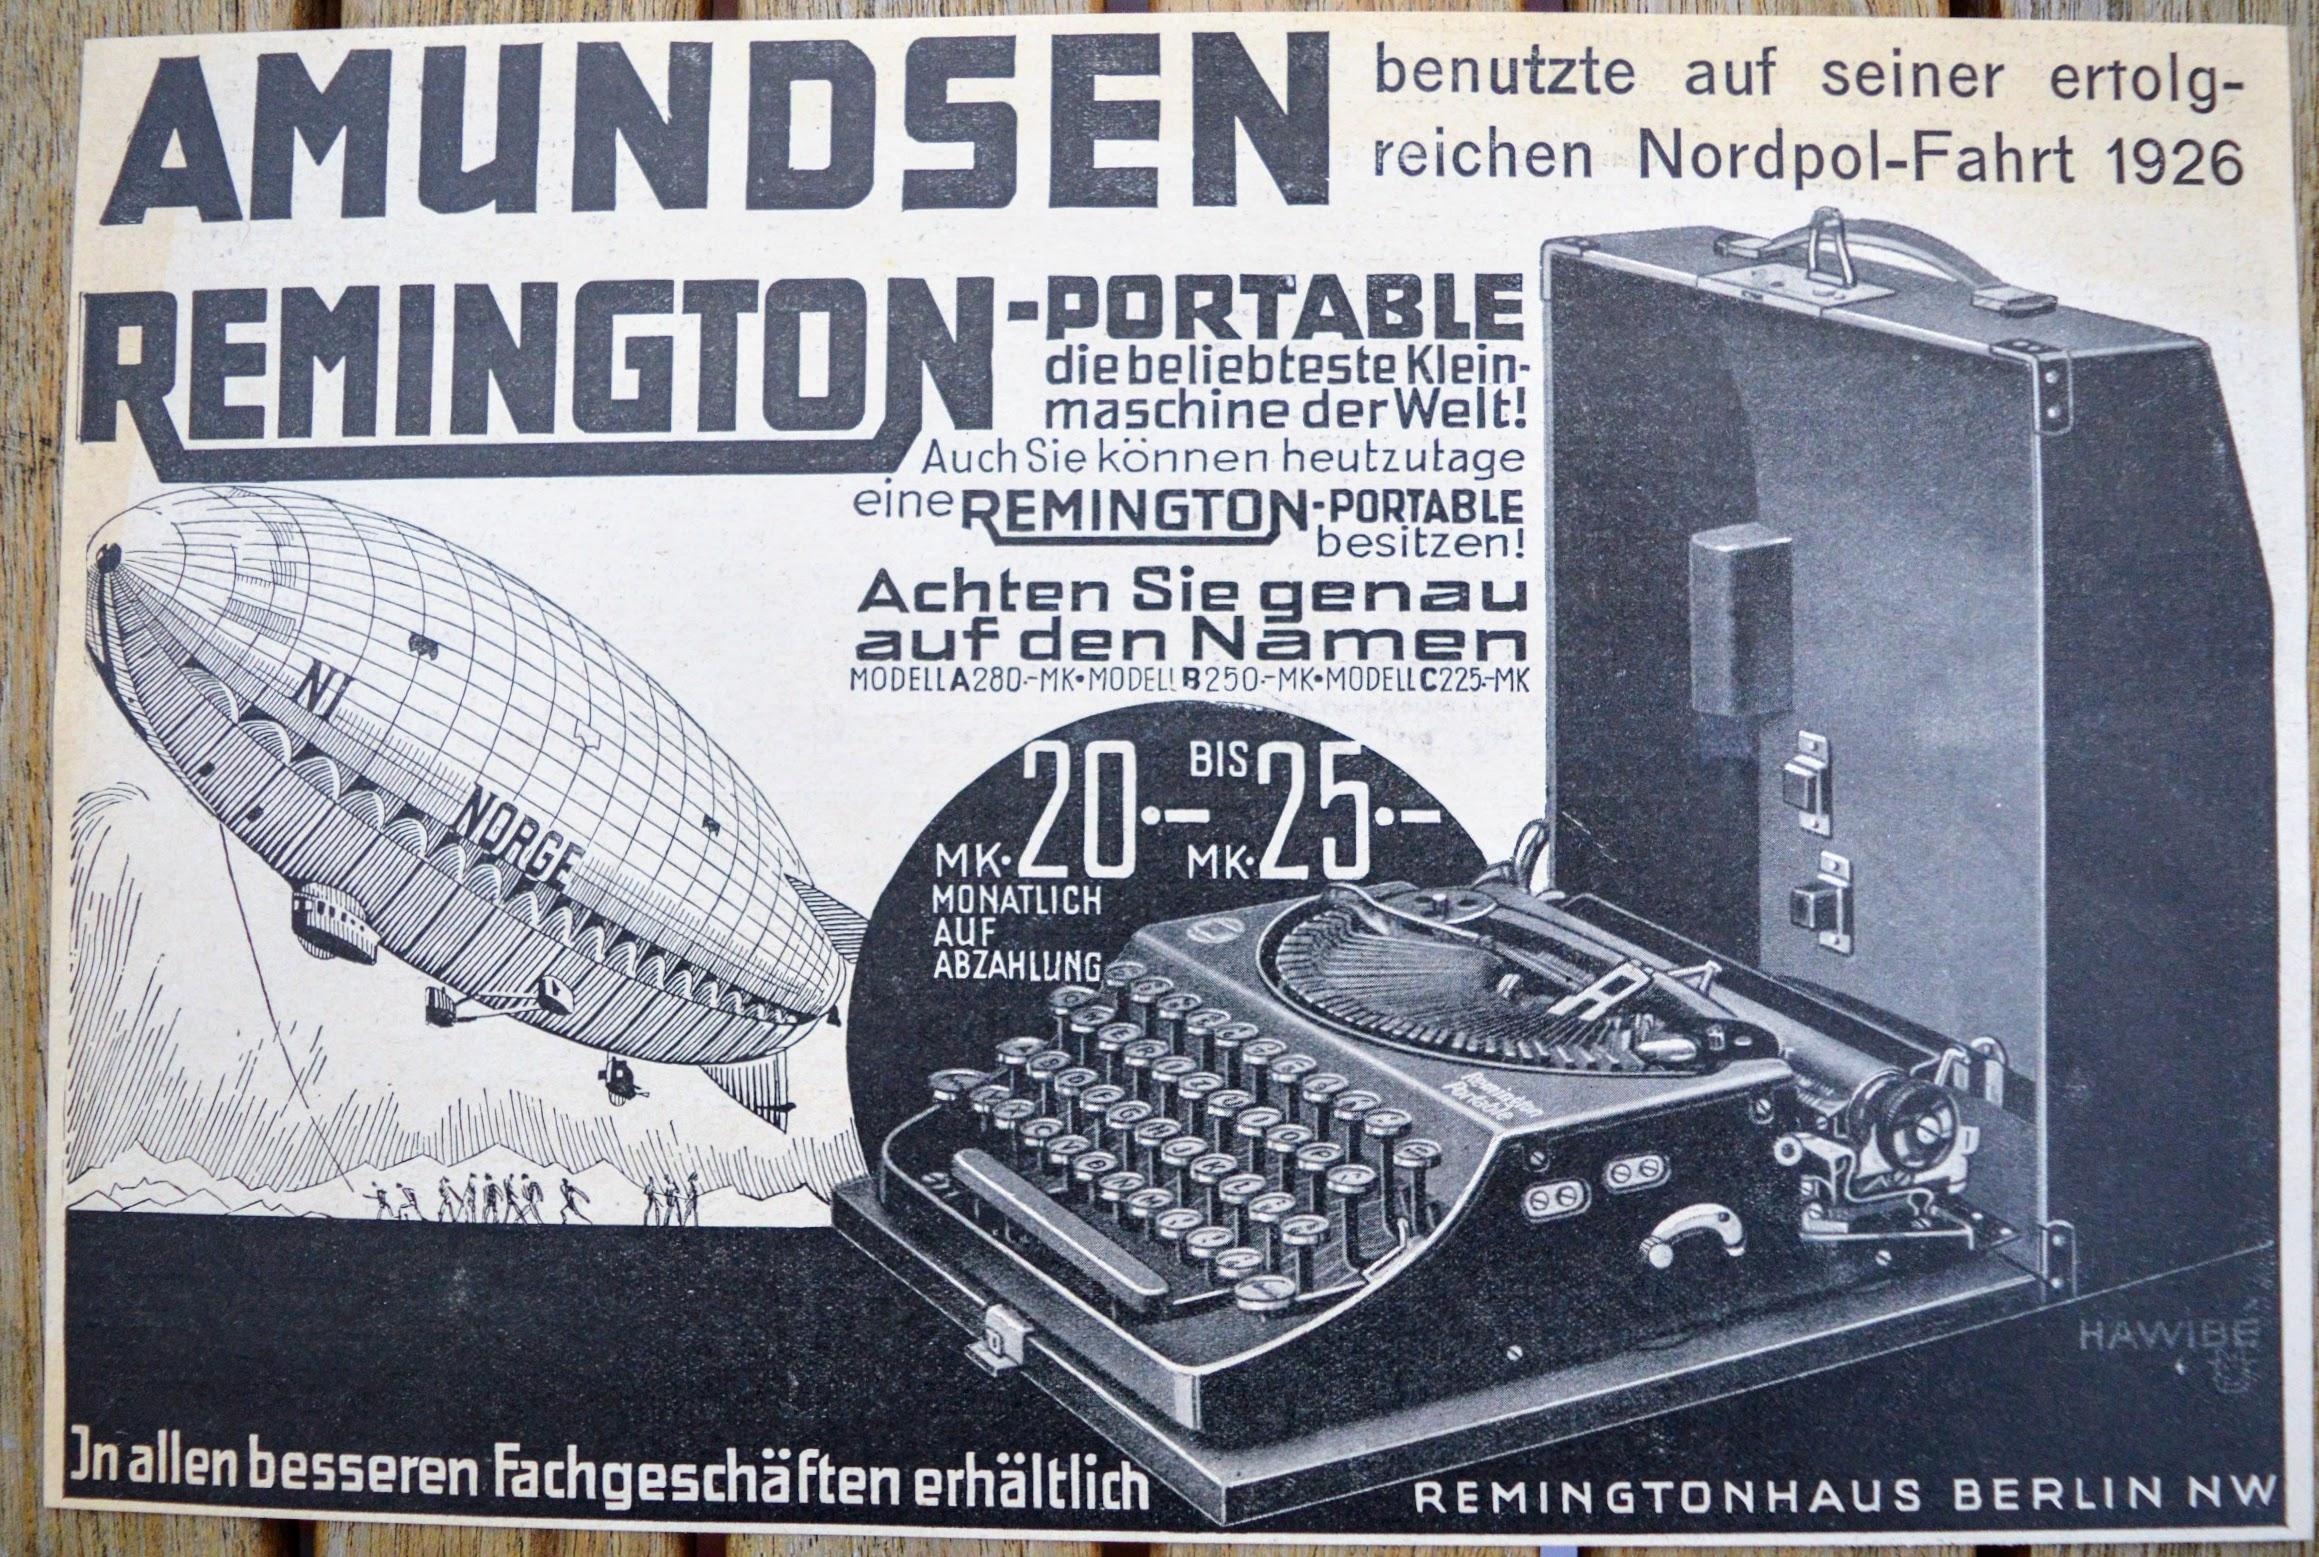 Remington Portable - Werbung - Amundsen Nordpol-Fahrt 1926